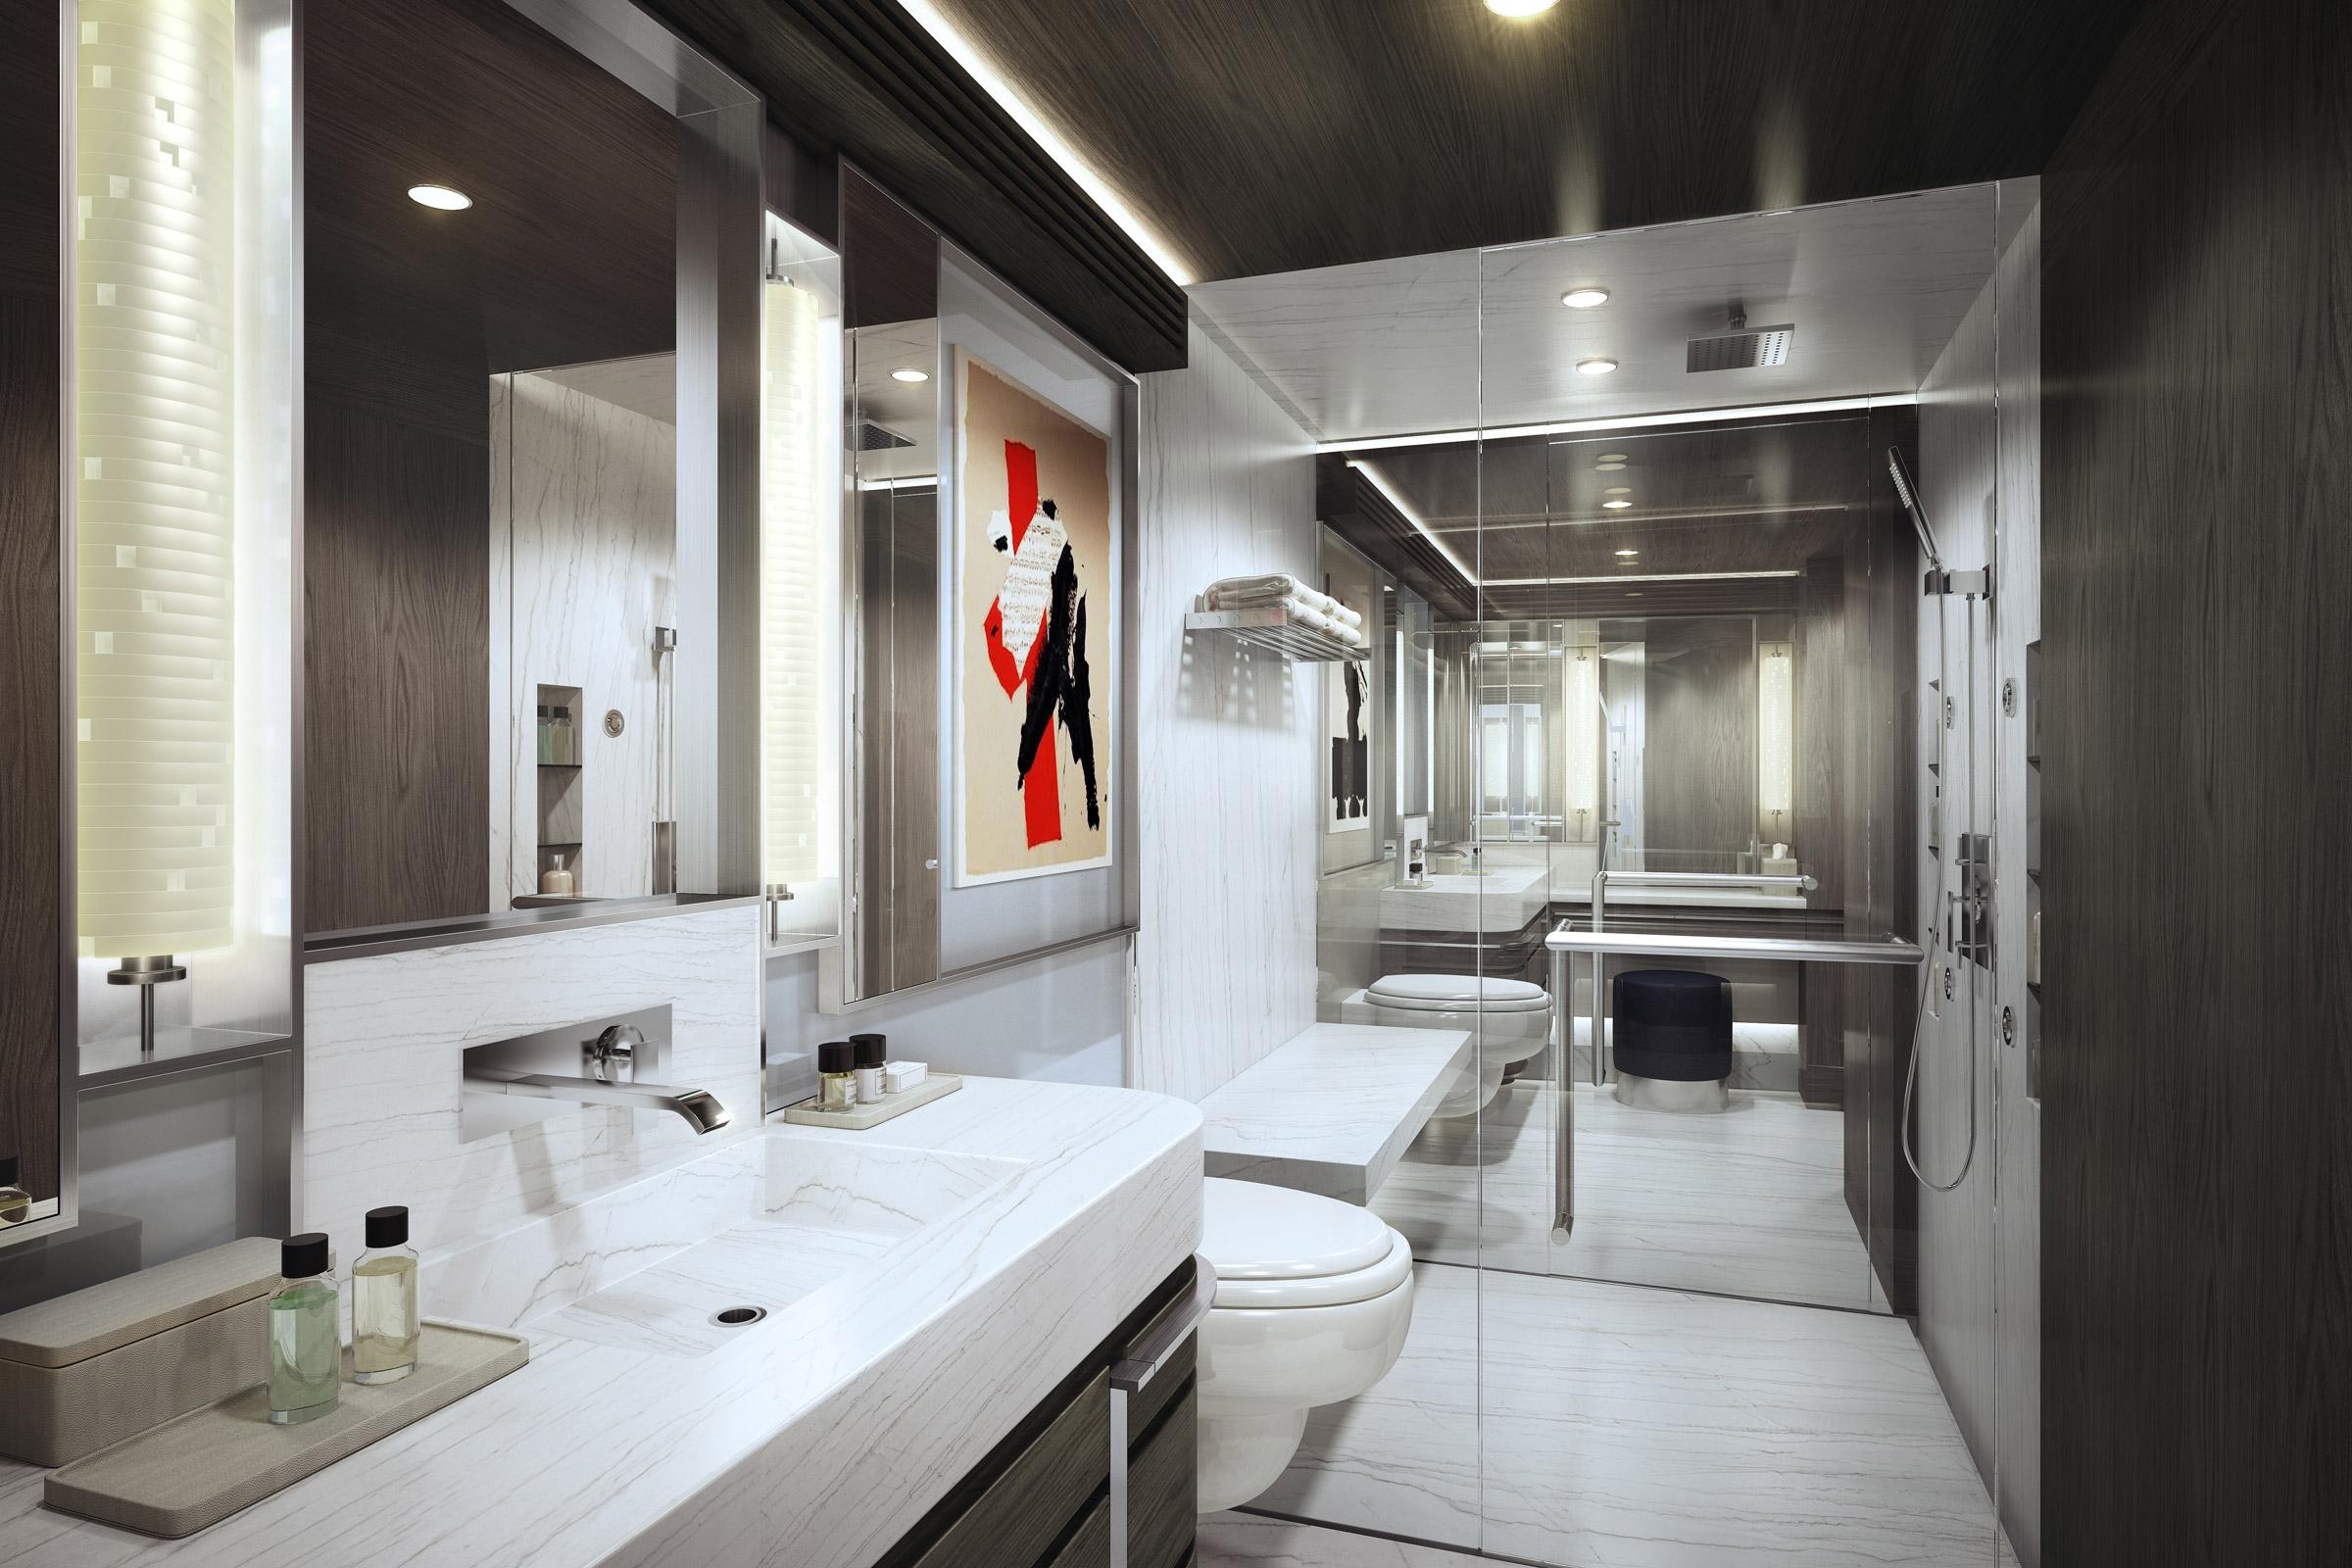 HH_Yacht_Master_Bathroom_Cam2_V2_005